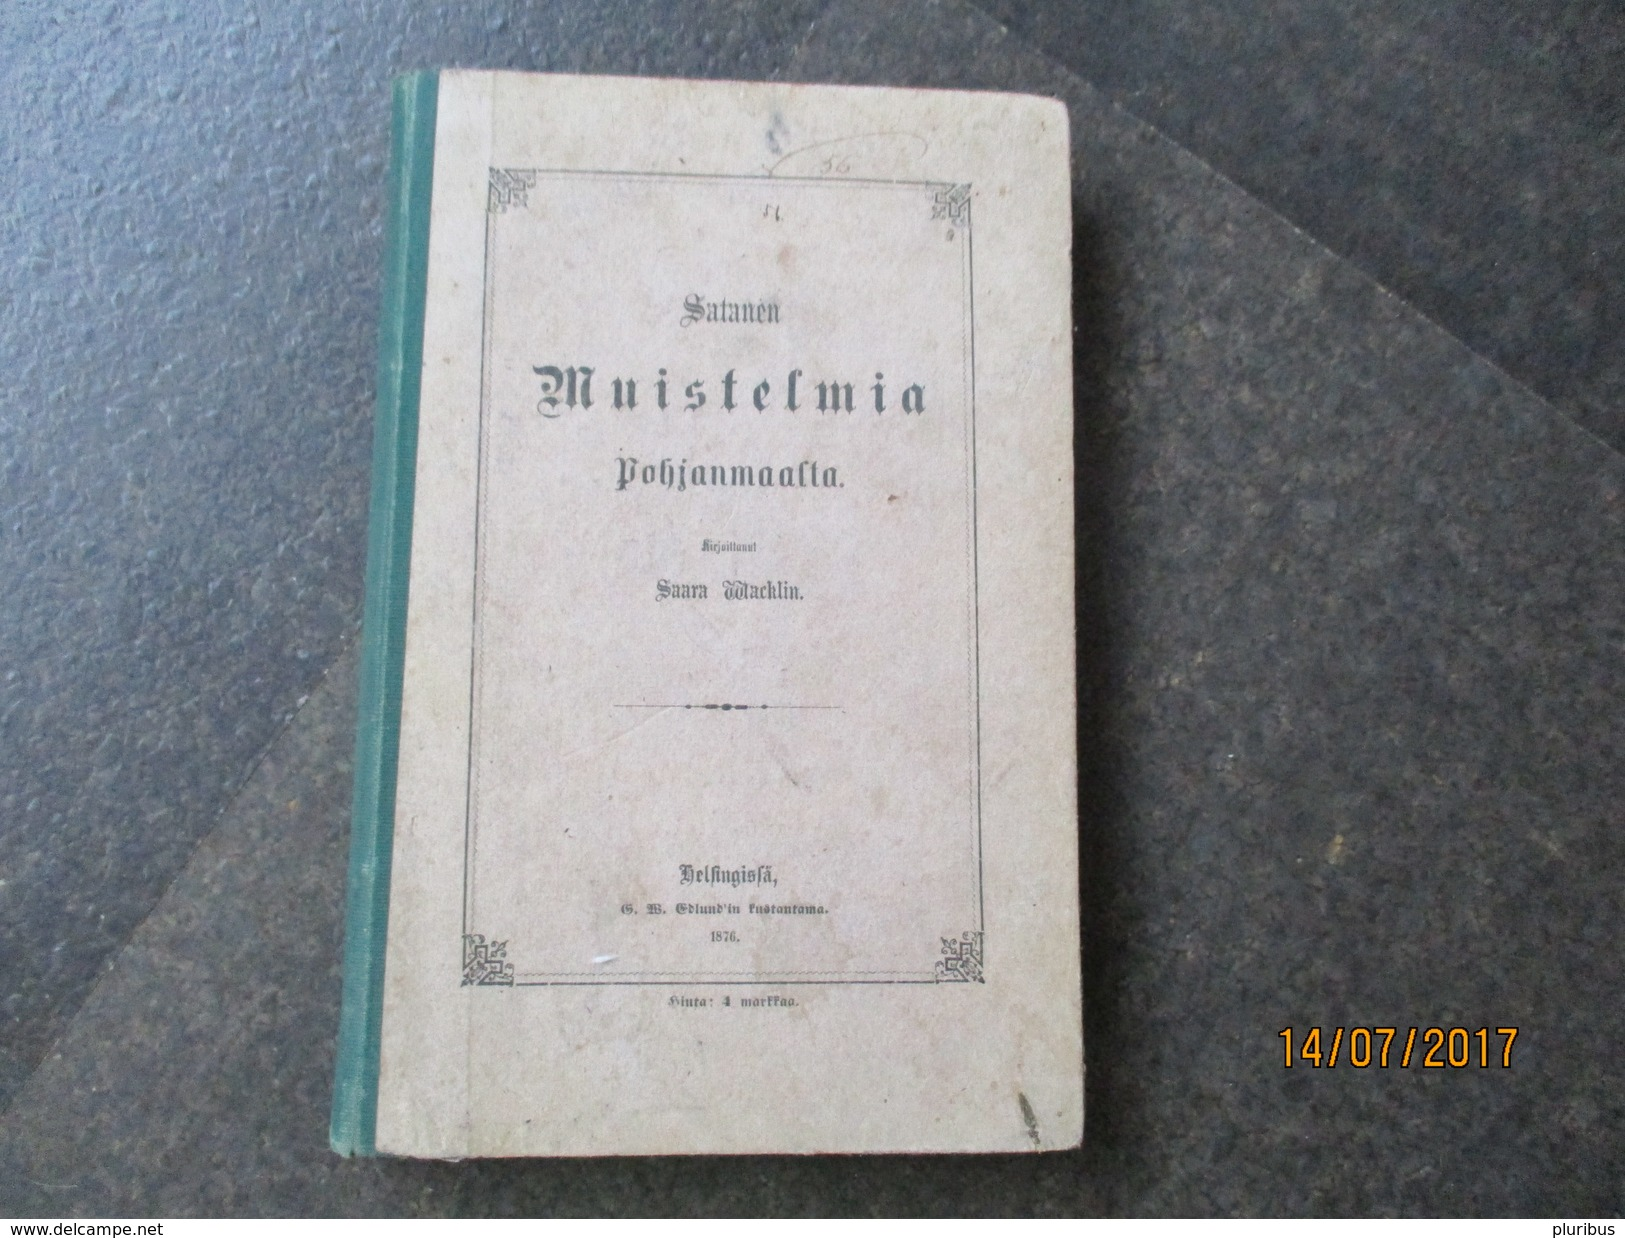 FINLAND HELSINKI 1876 SATANEN MUISTELMIA POHJANMAASTA BY SAARA WACKLIN    ,0 - Scandinavian Languages